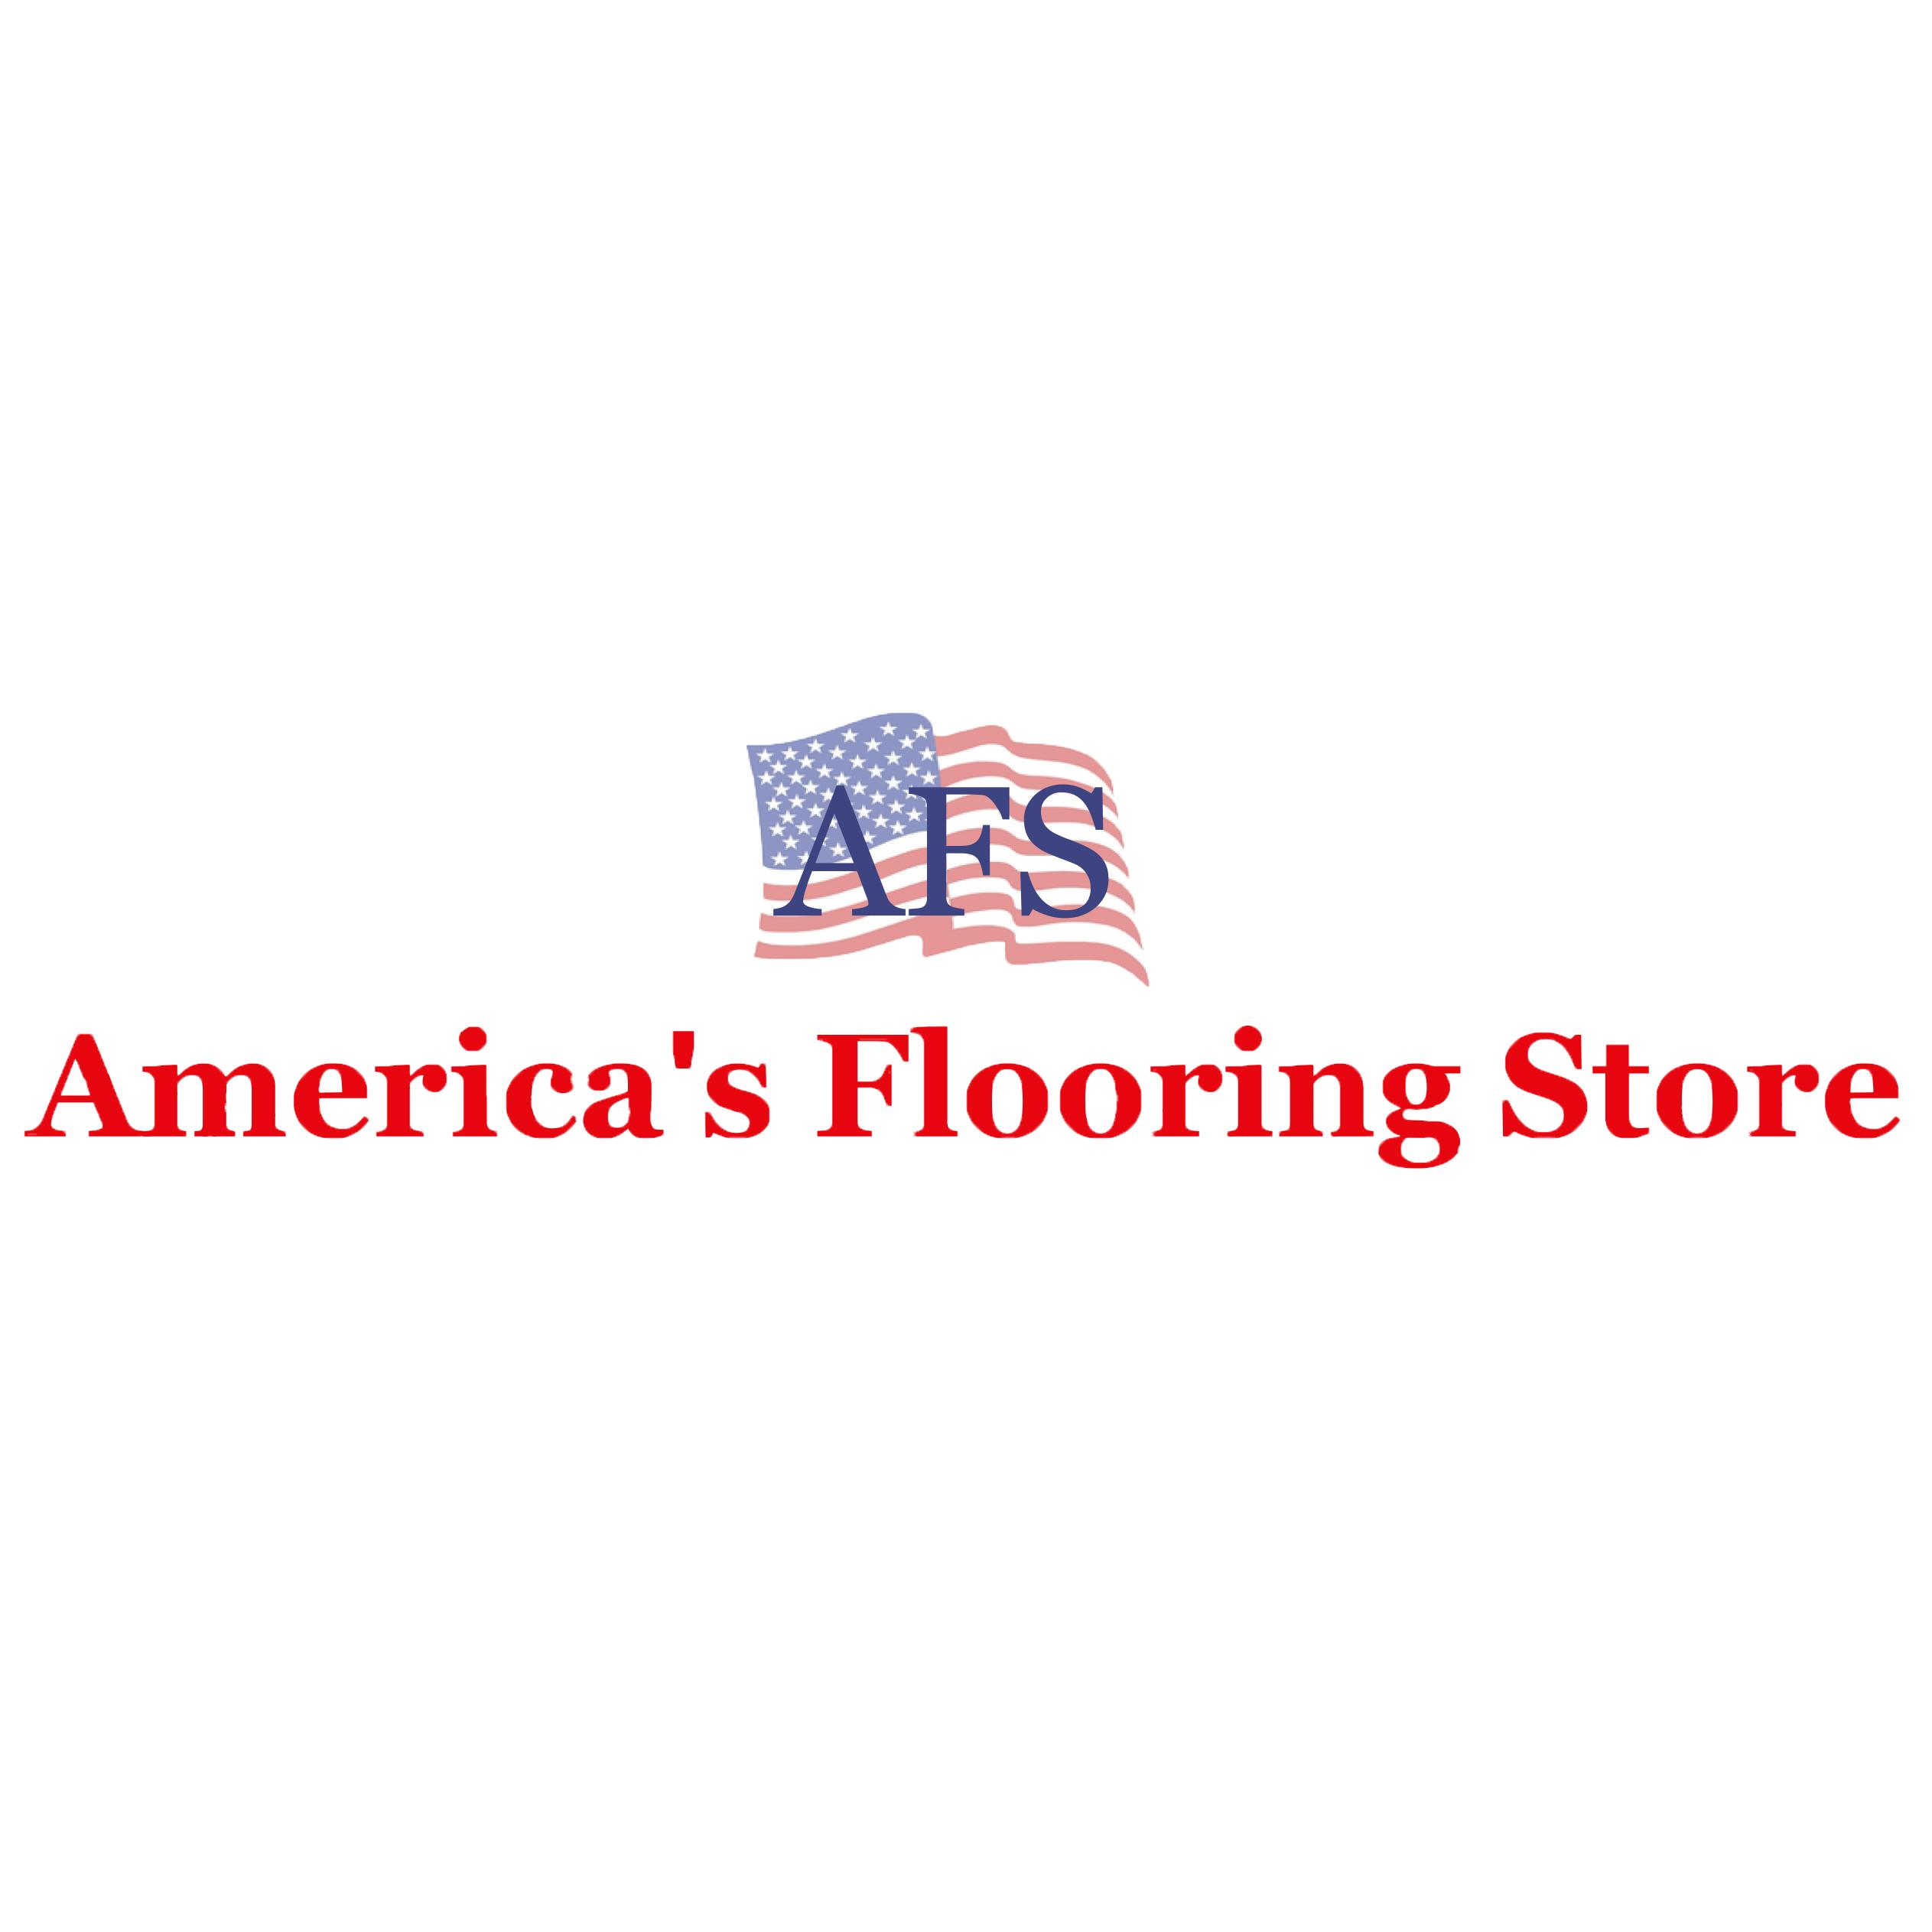 America's Flooring Store